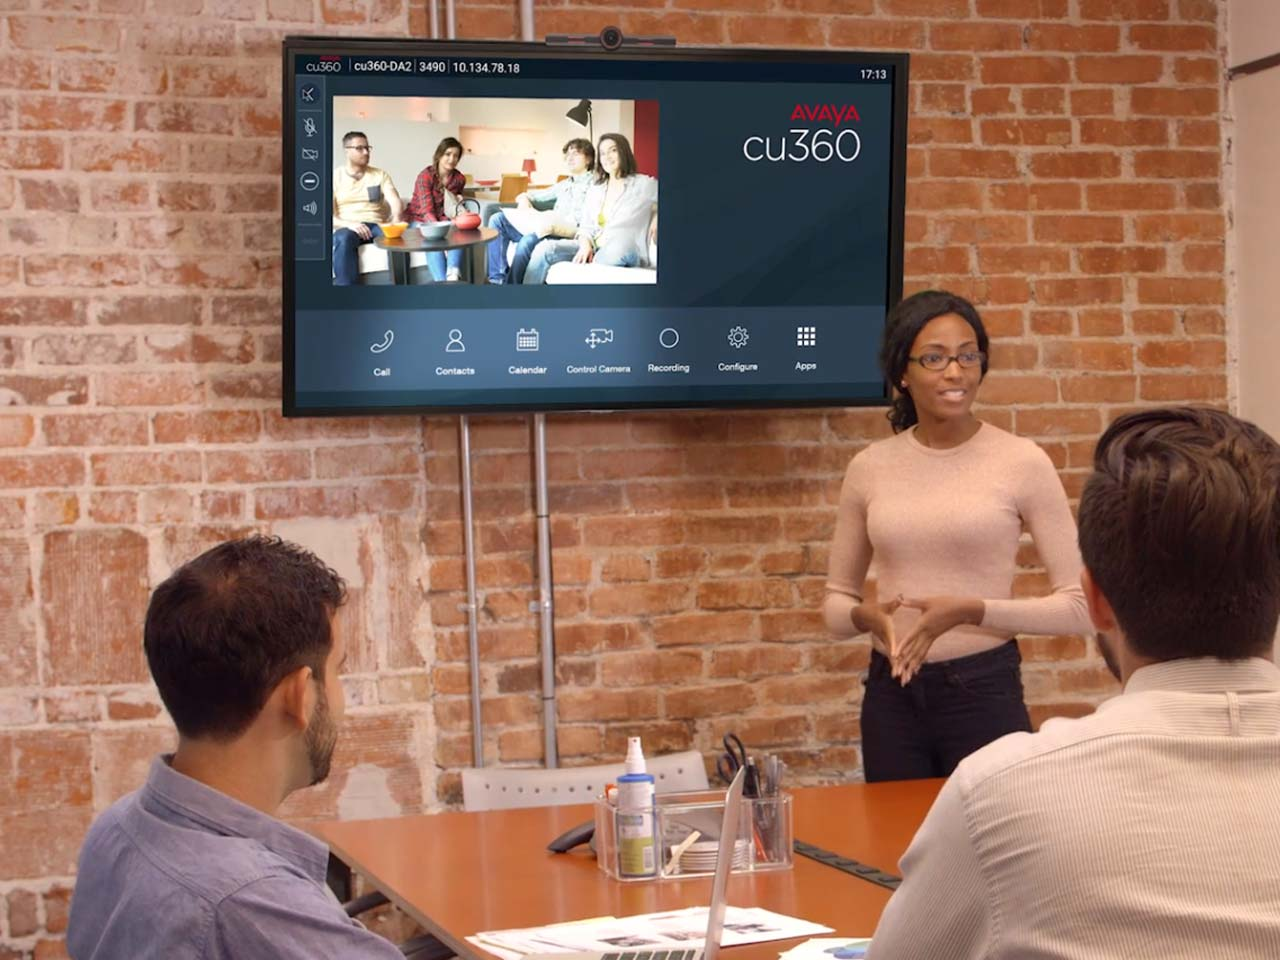 video meeting plus conference room, using Avaya CU360